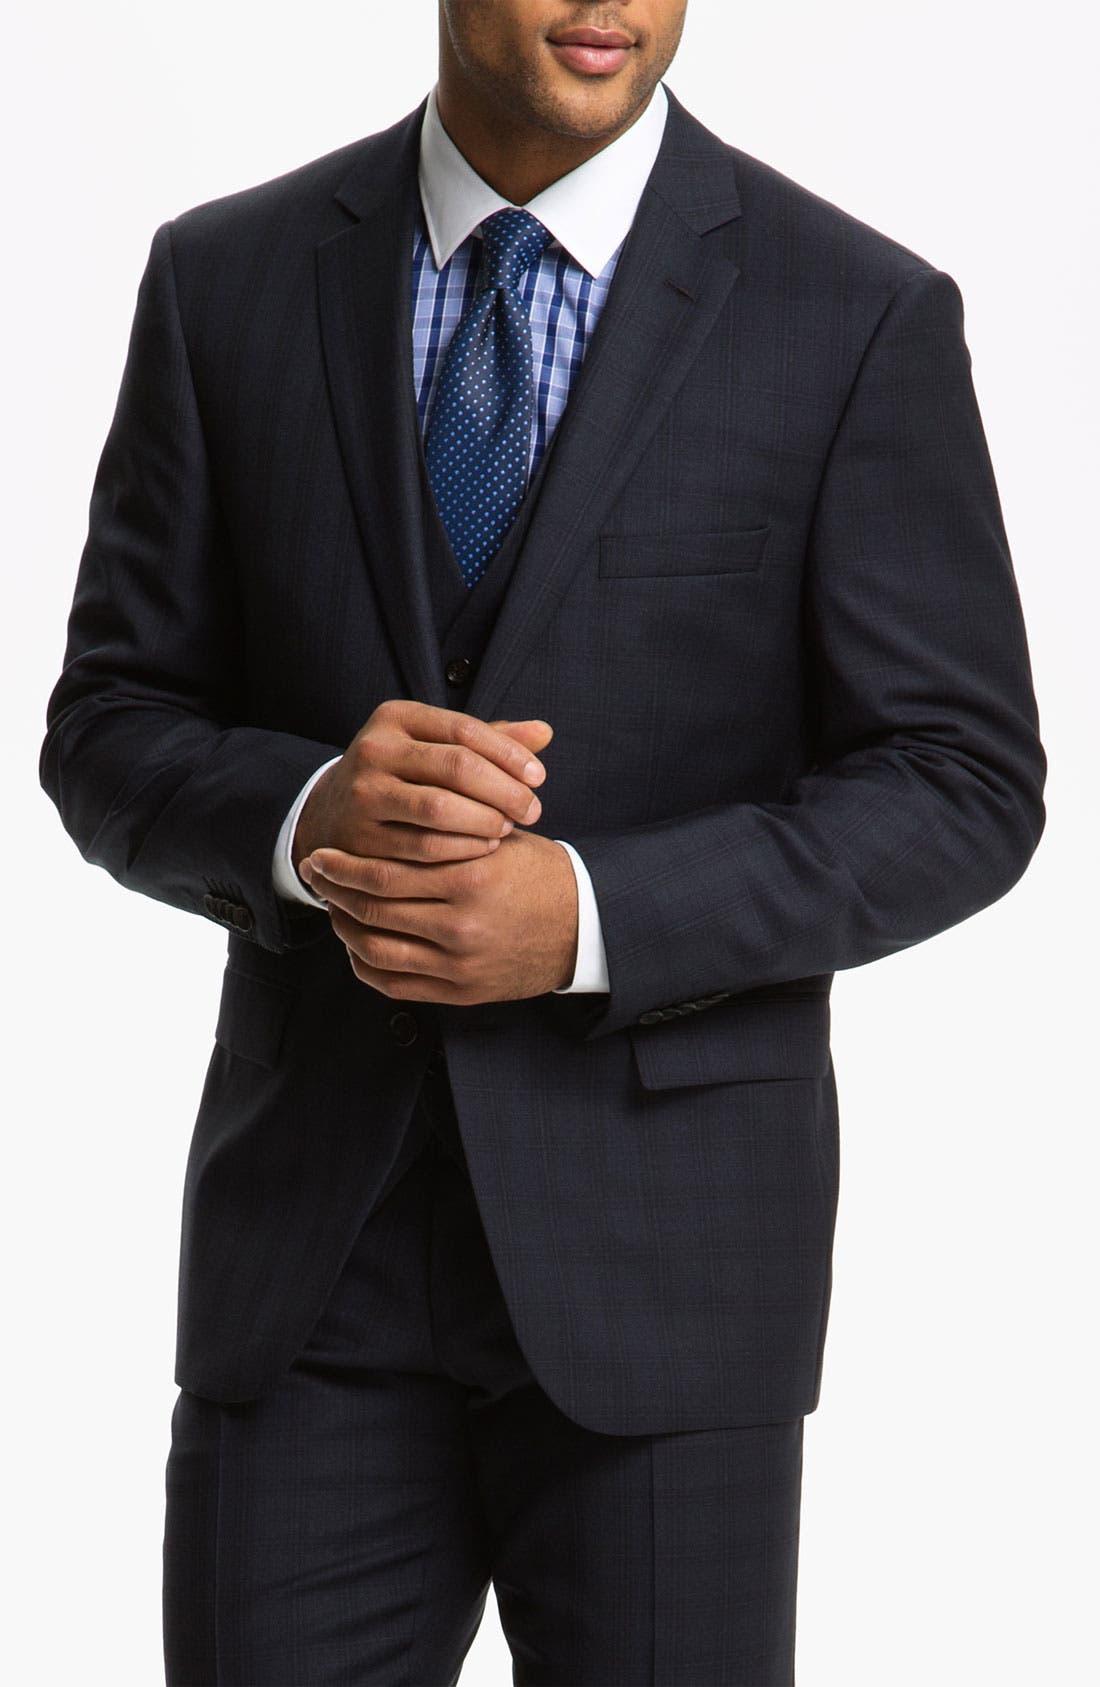 Main Image - BOSS Selection Suit & BOSS Black Dress Shirt